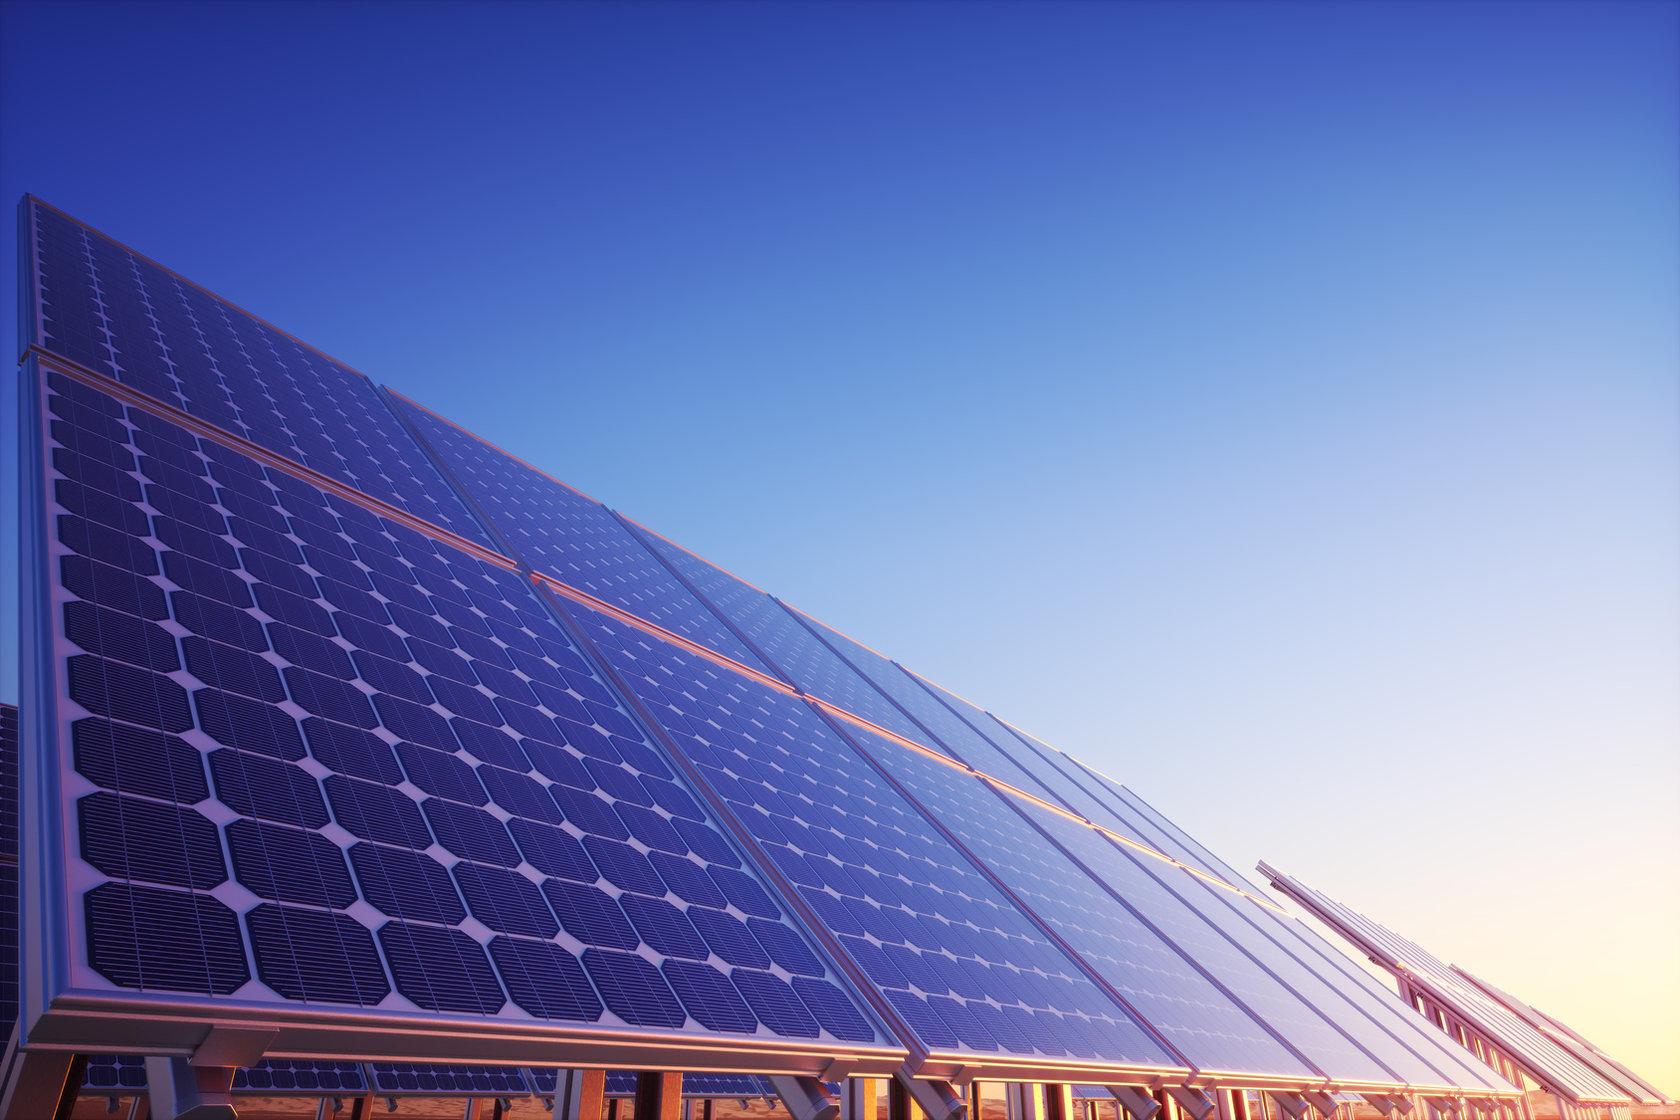 Photovoltaik van de loo solartechnik gmbh for Innendekoration vankann gmbh